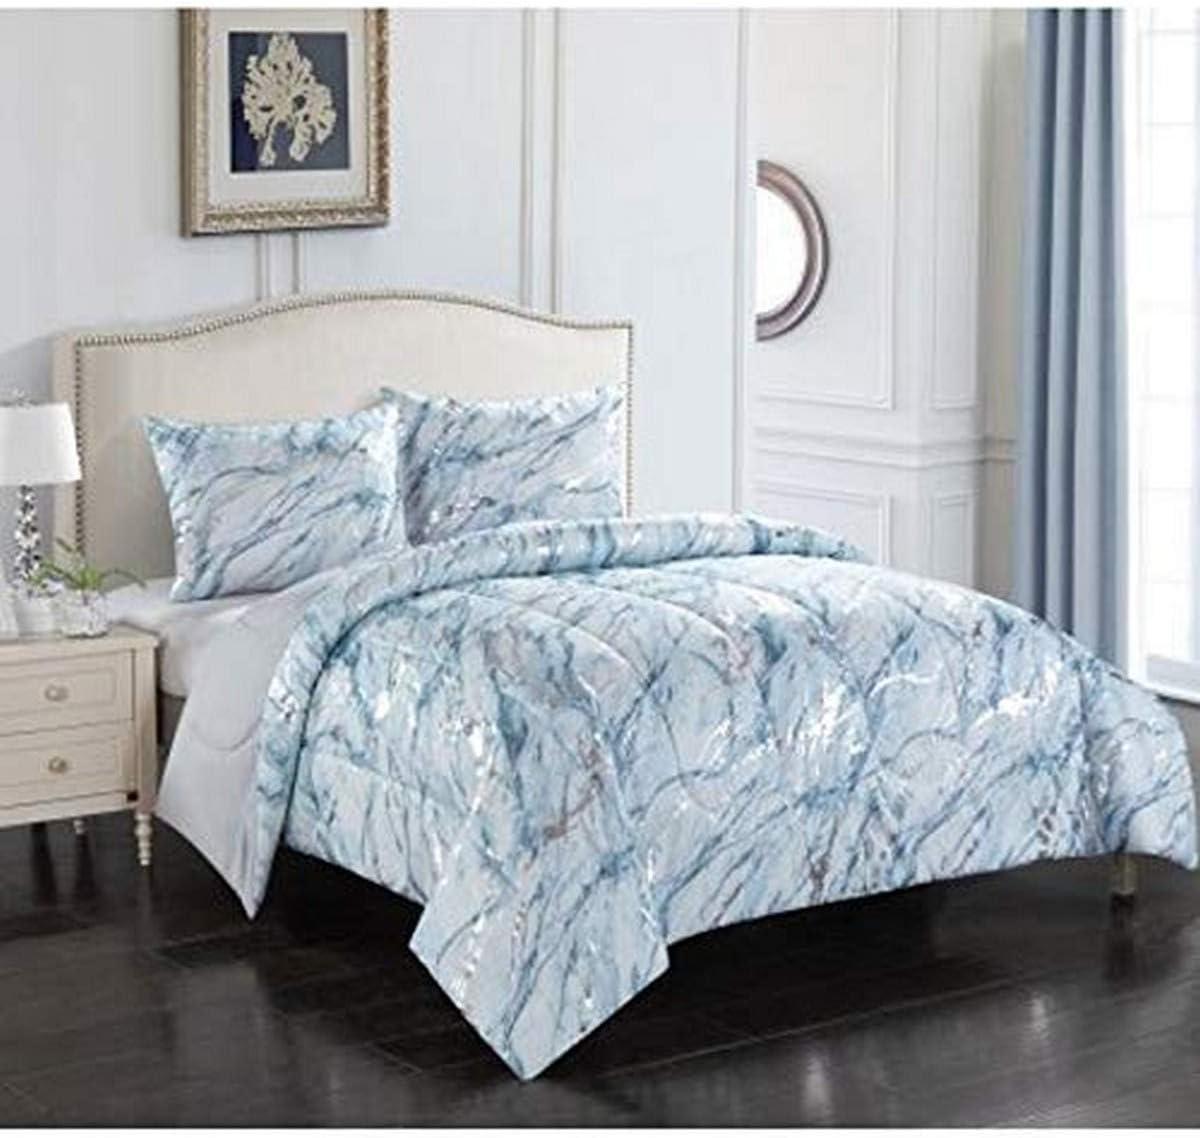 Idea Nuova Comforter Set Polyester Silver Twin Xl Amazon Co Uk Kitchen Home